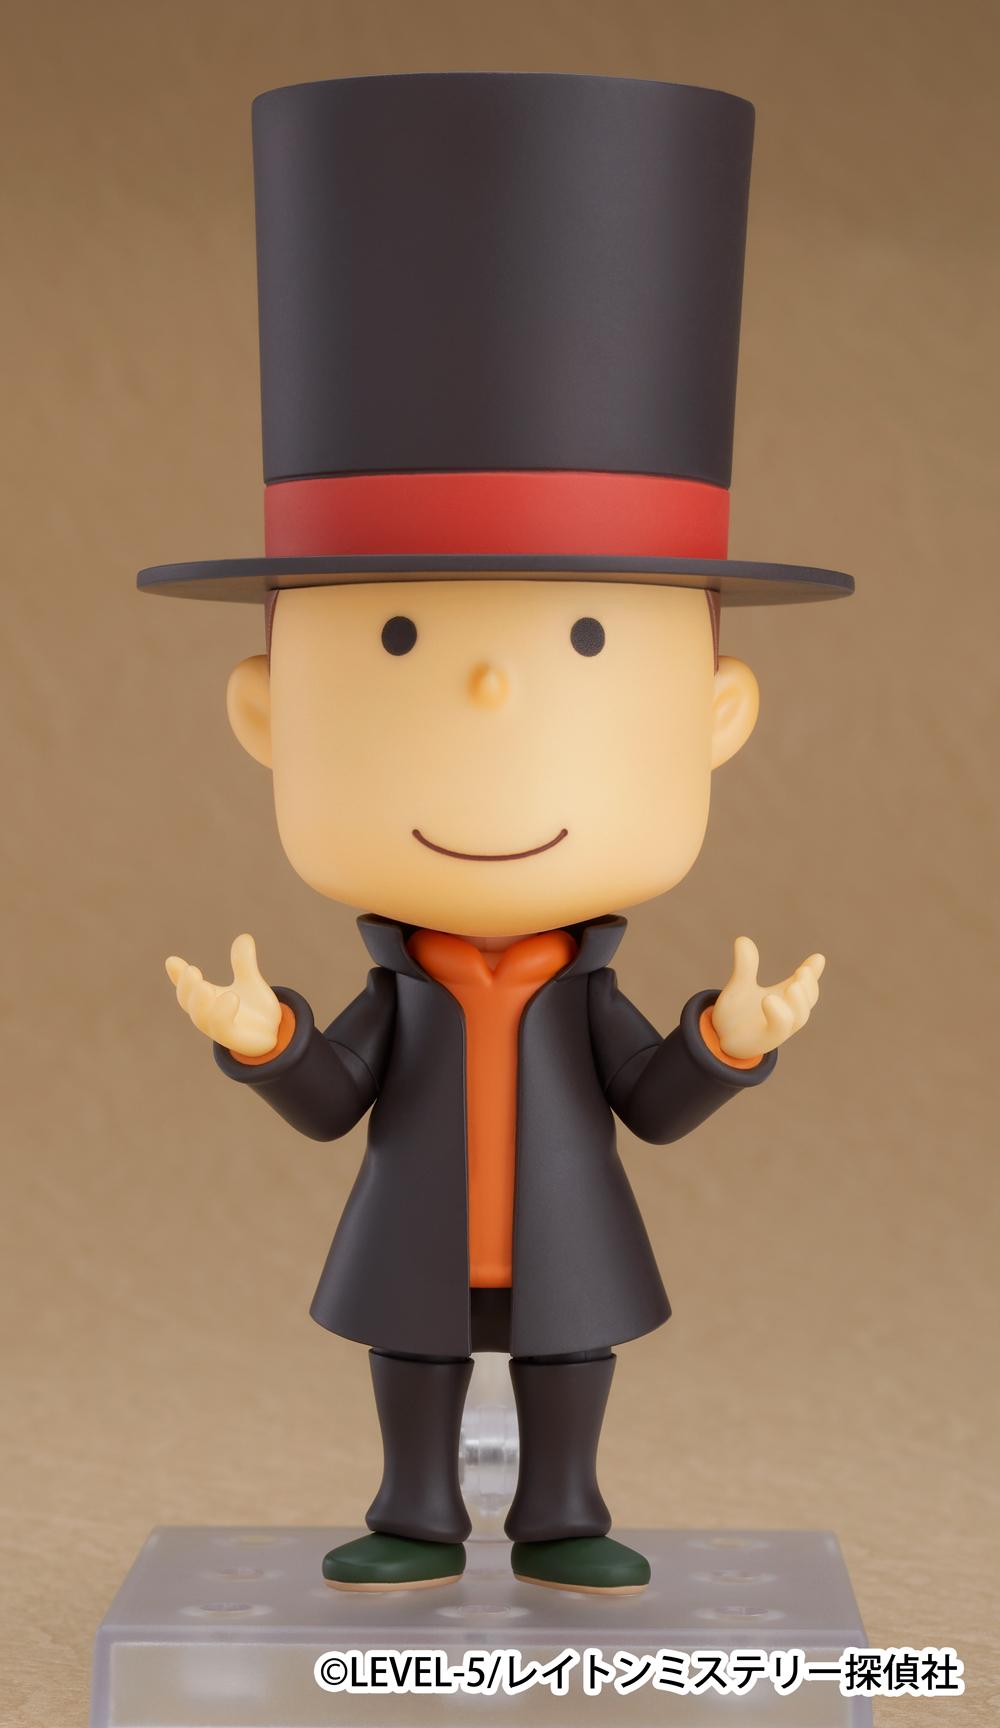 Professor Layton - Nendroid Good Smile Company